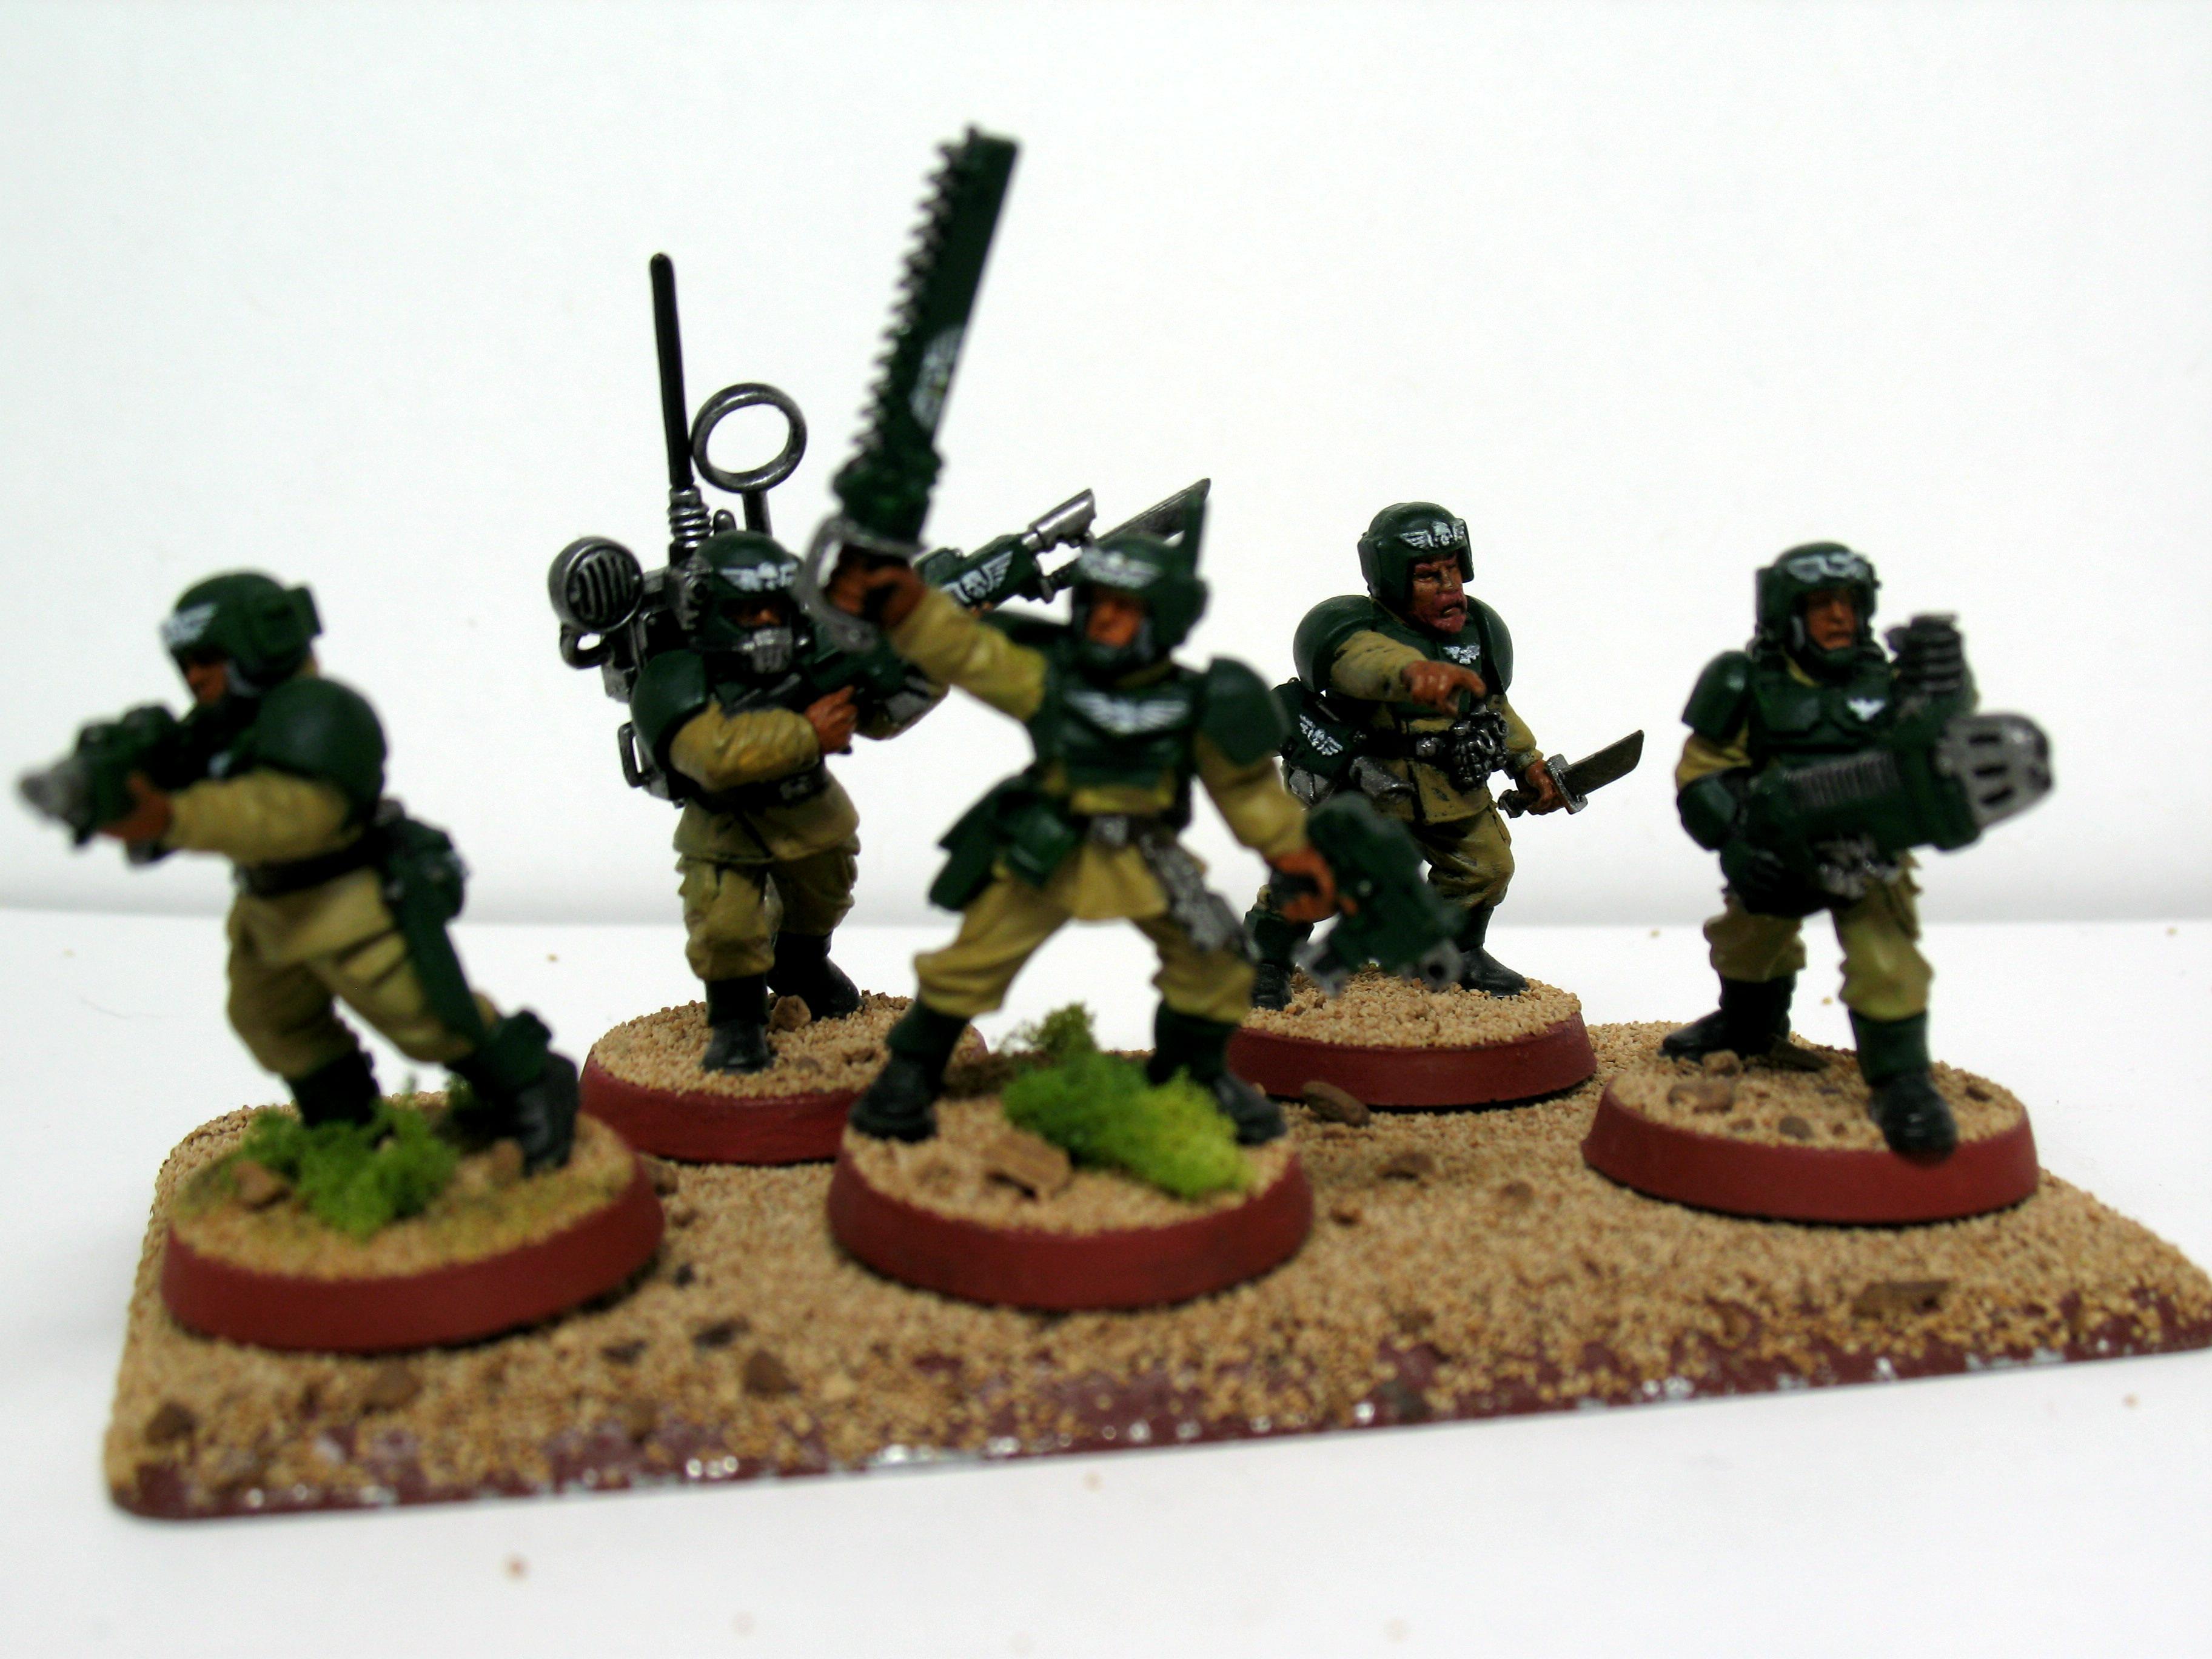 11th, Assault, Cadian Assault, Cadians, Cmd, Command, Grunts, Guard, Headquarters, Imperial, Imperial Guard, Infantry, Jo, Junior Officer, Platoon